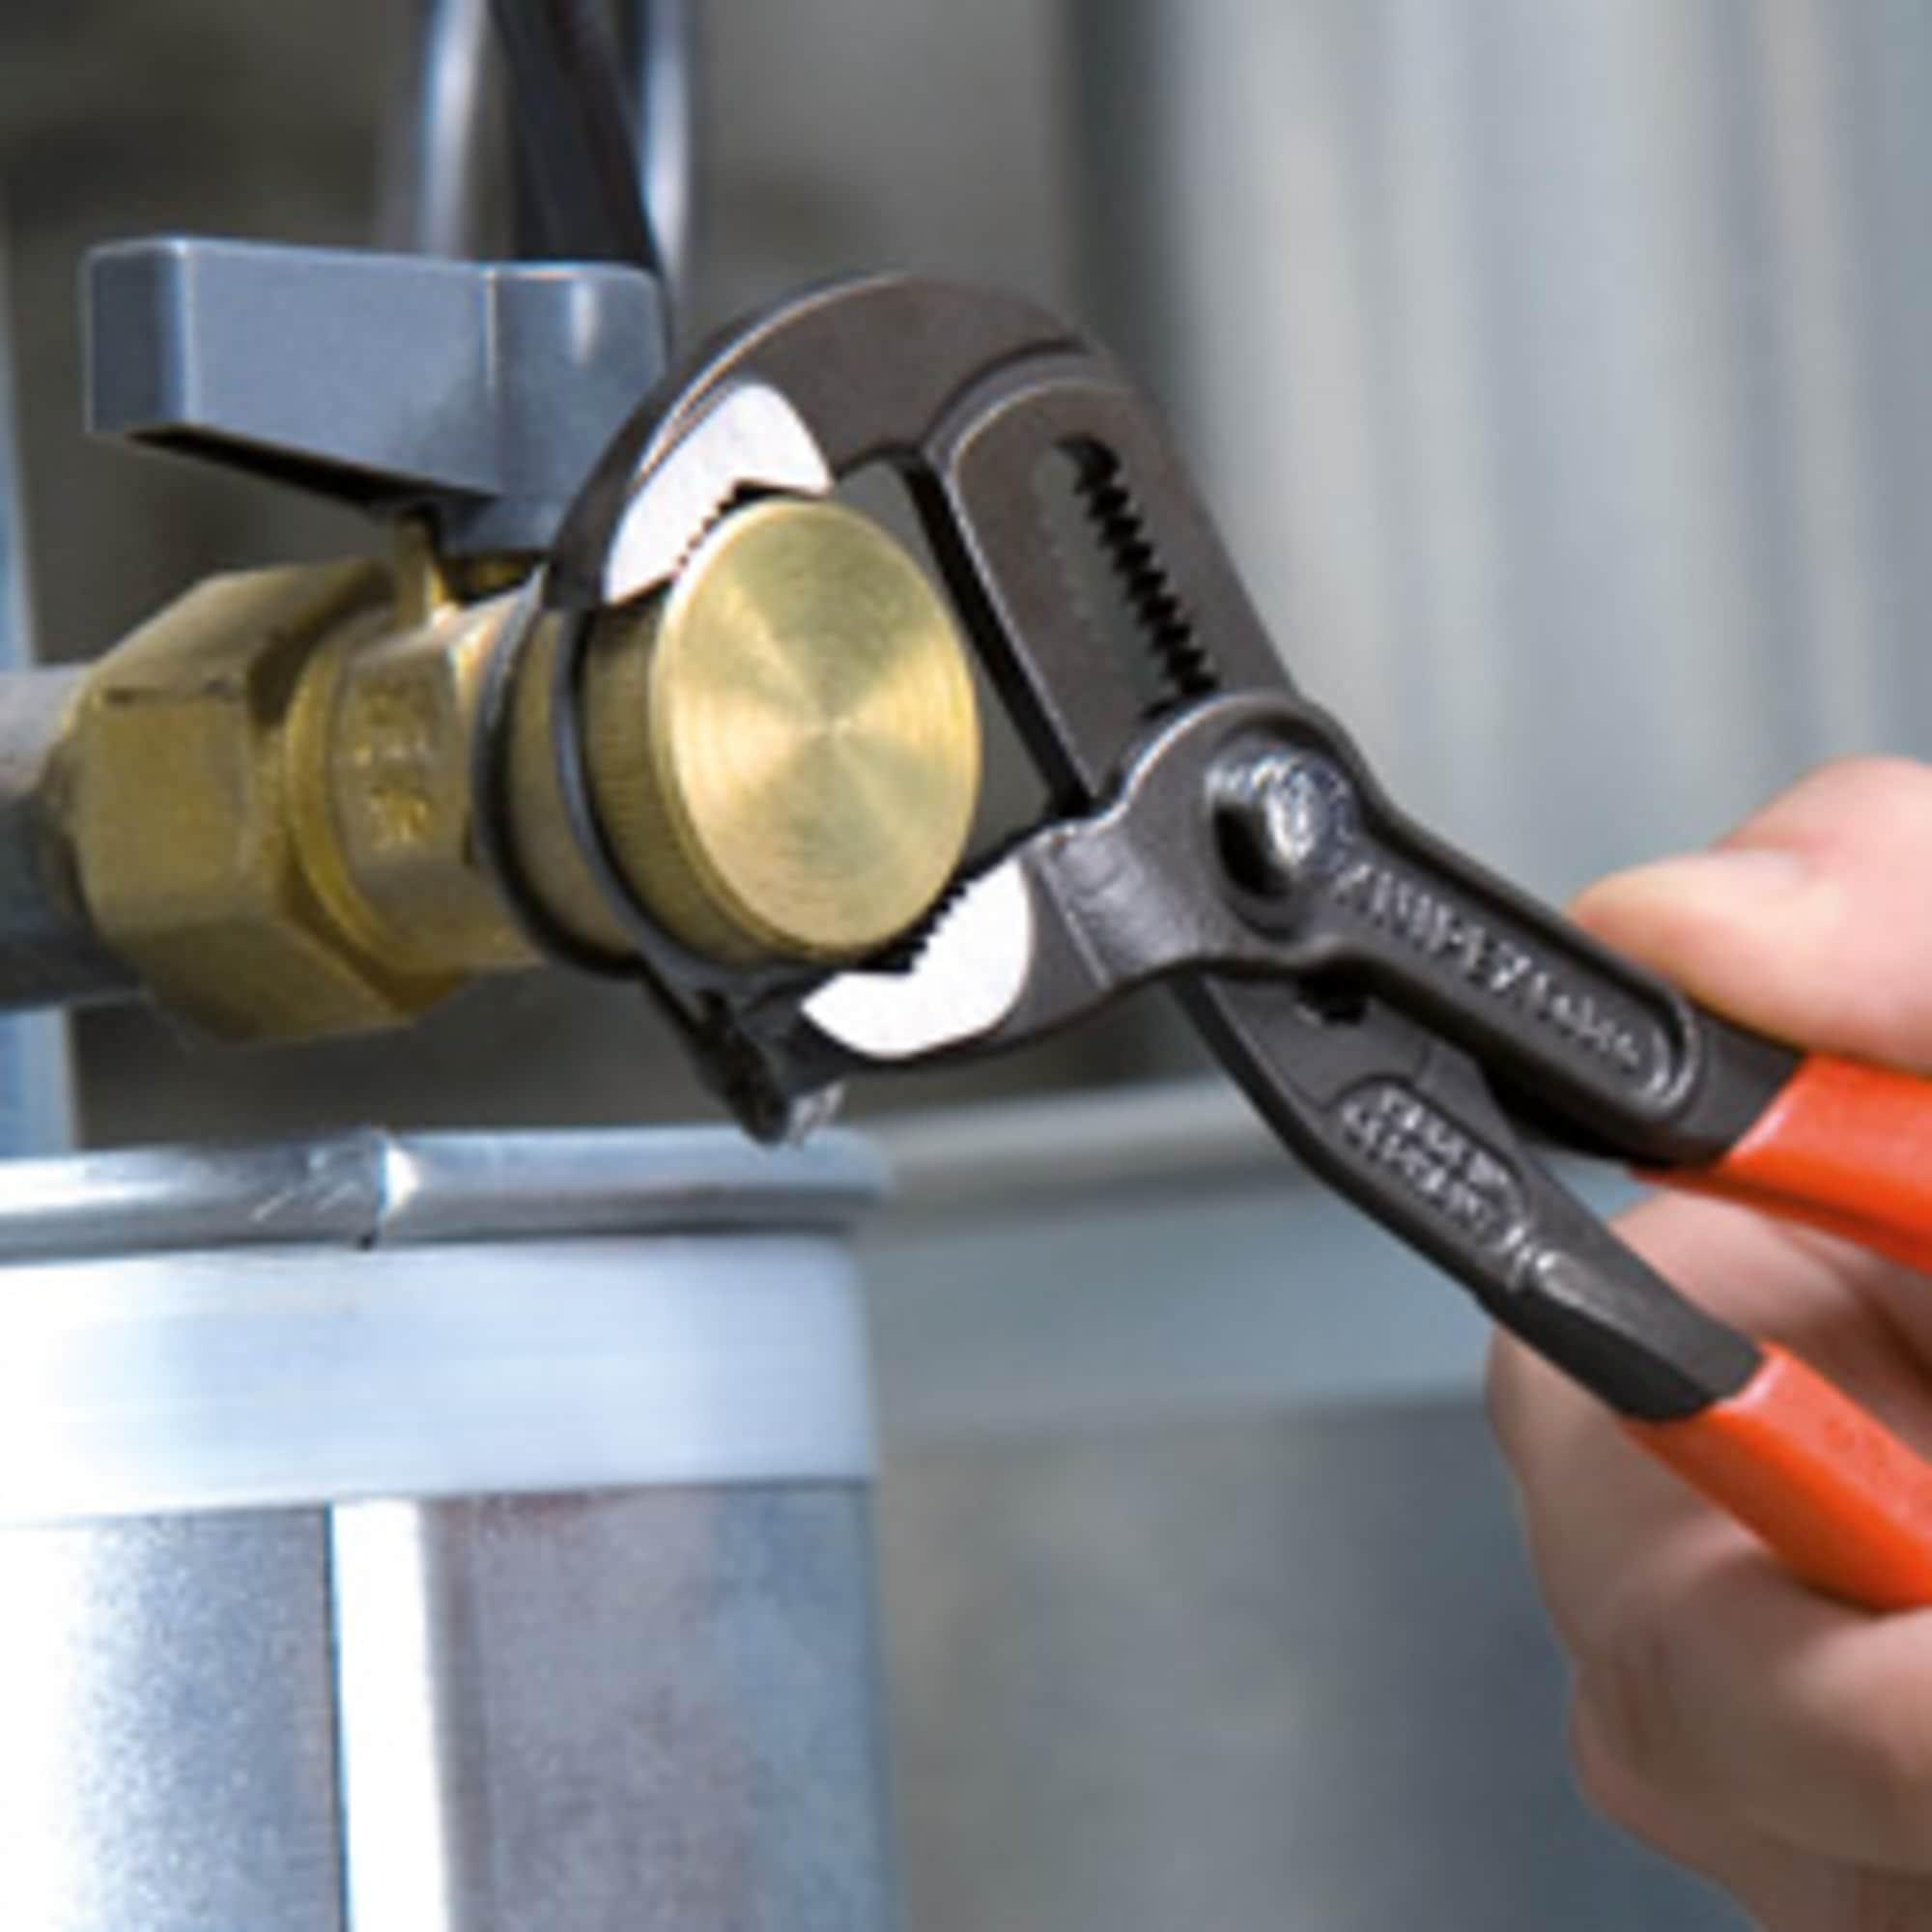 Knipex Rohr- / Wasserpumpen-Zange Cobra 87 01 250, 250mm